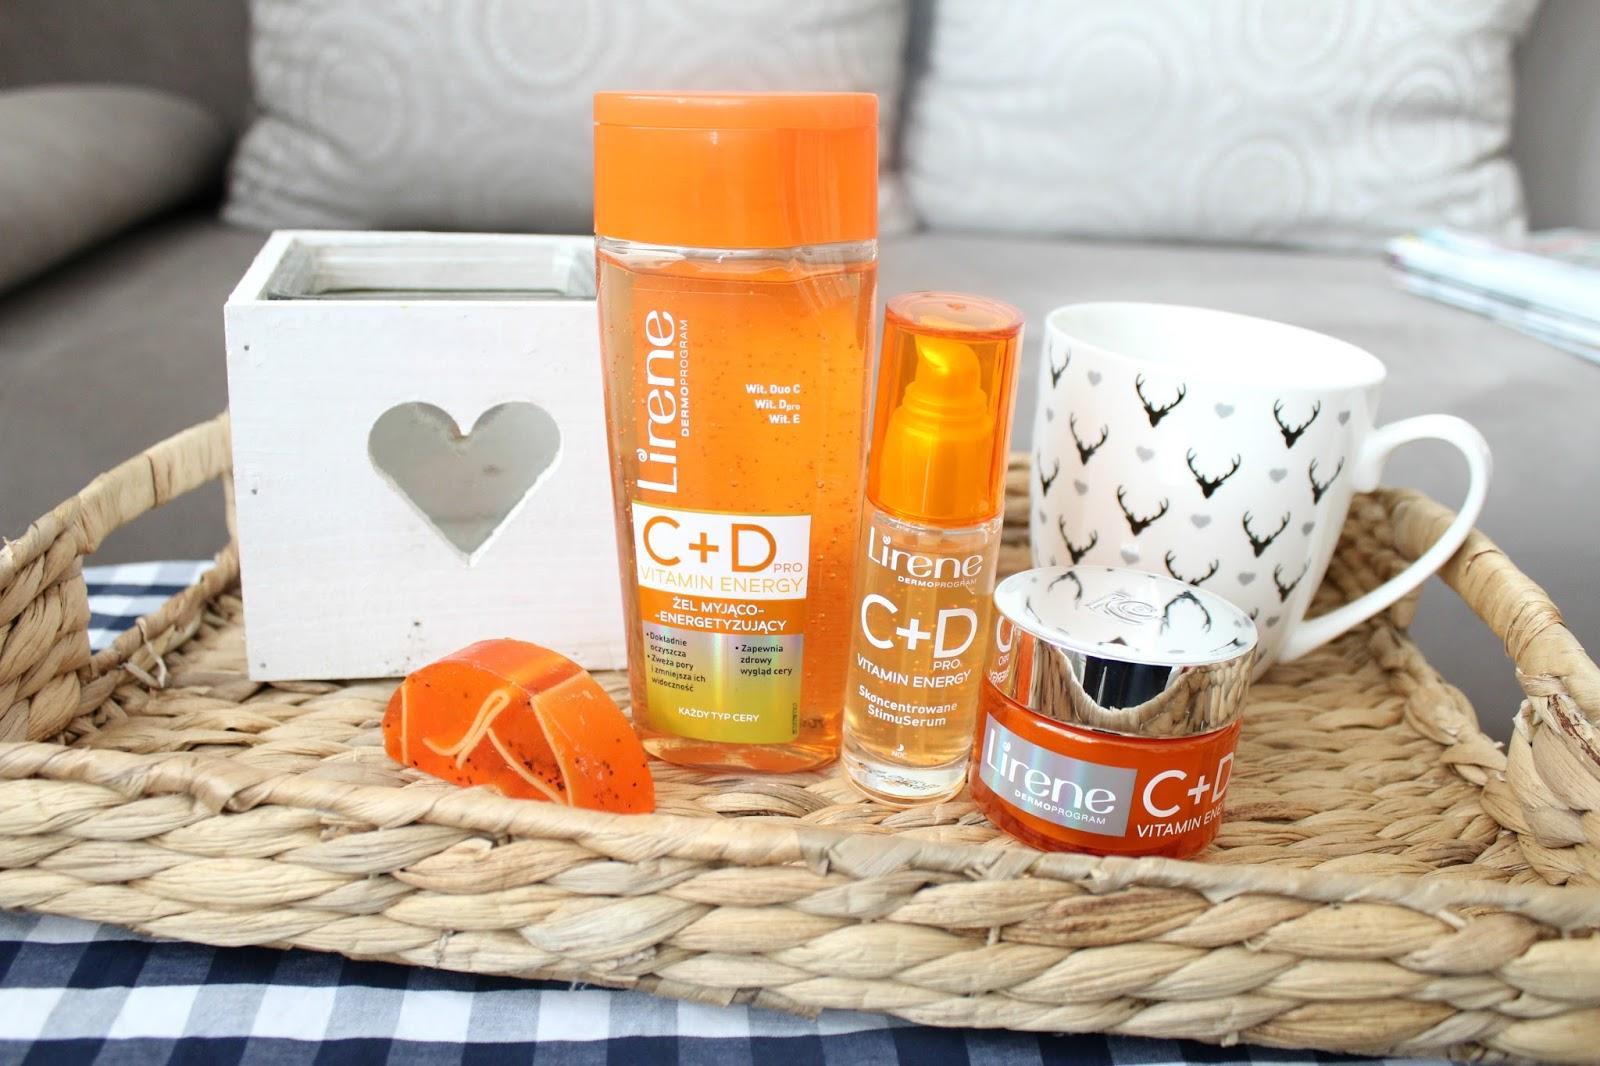 C+D PRO Vitamin Energy